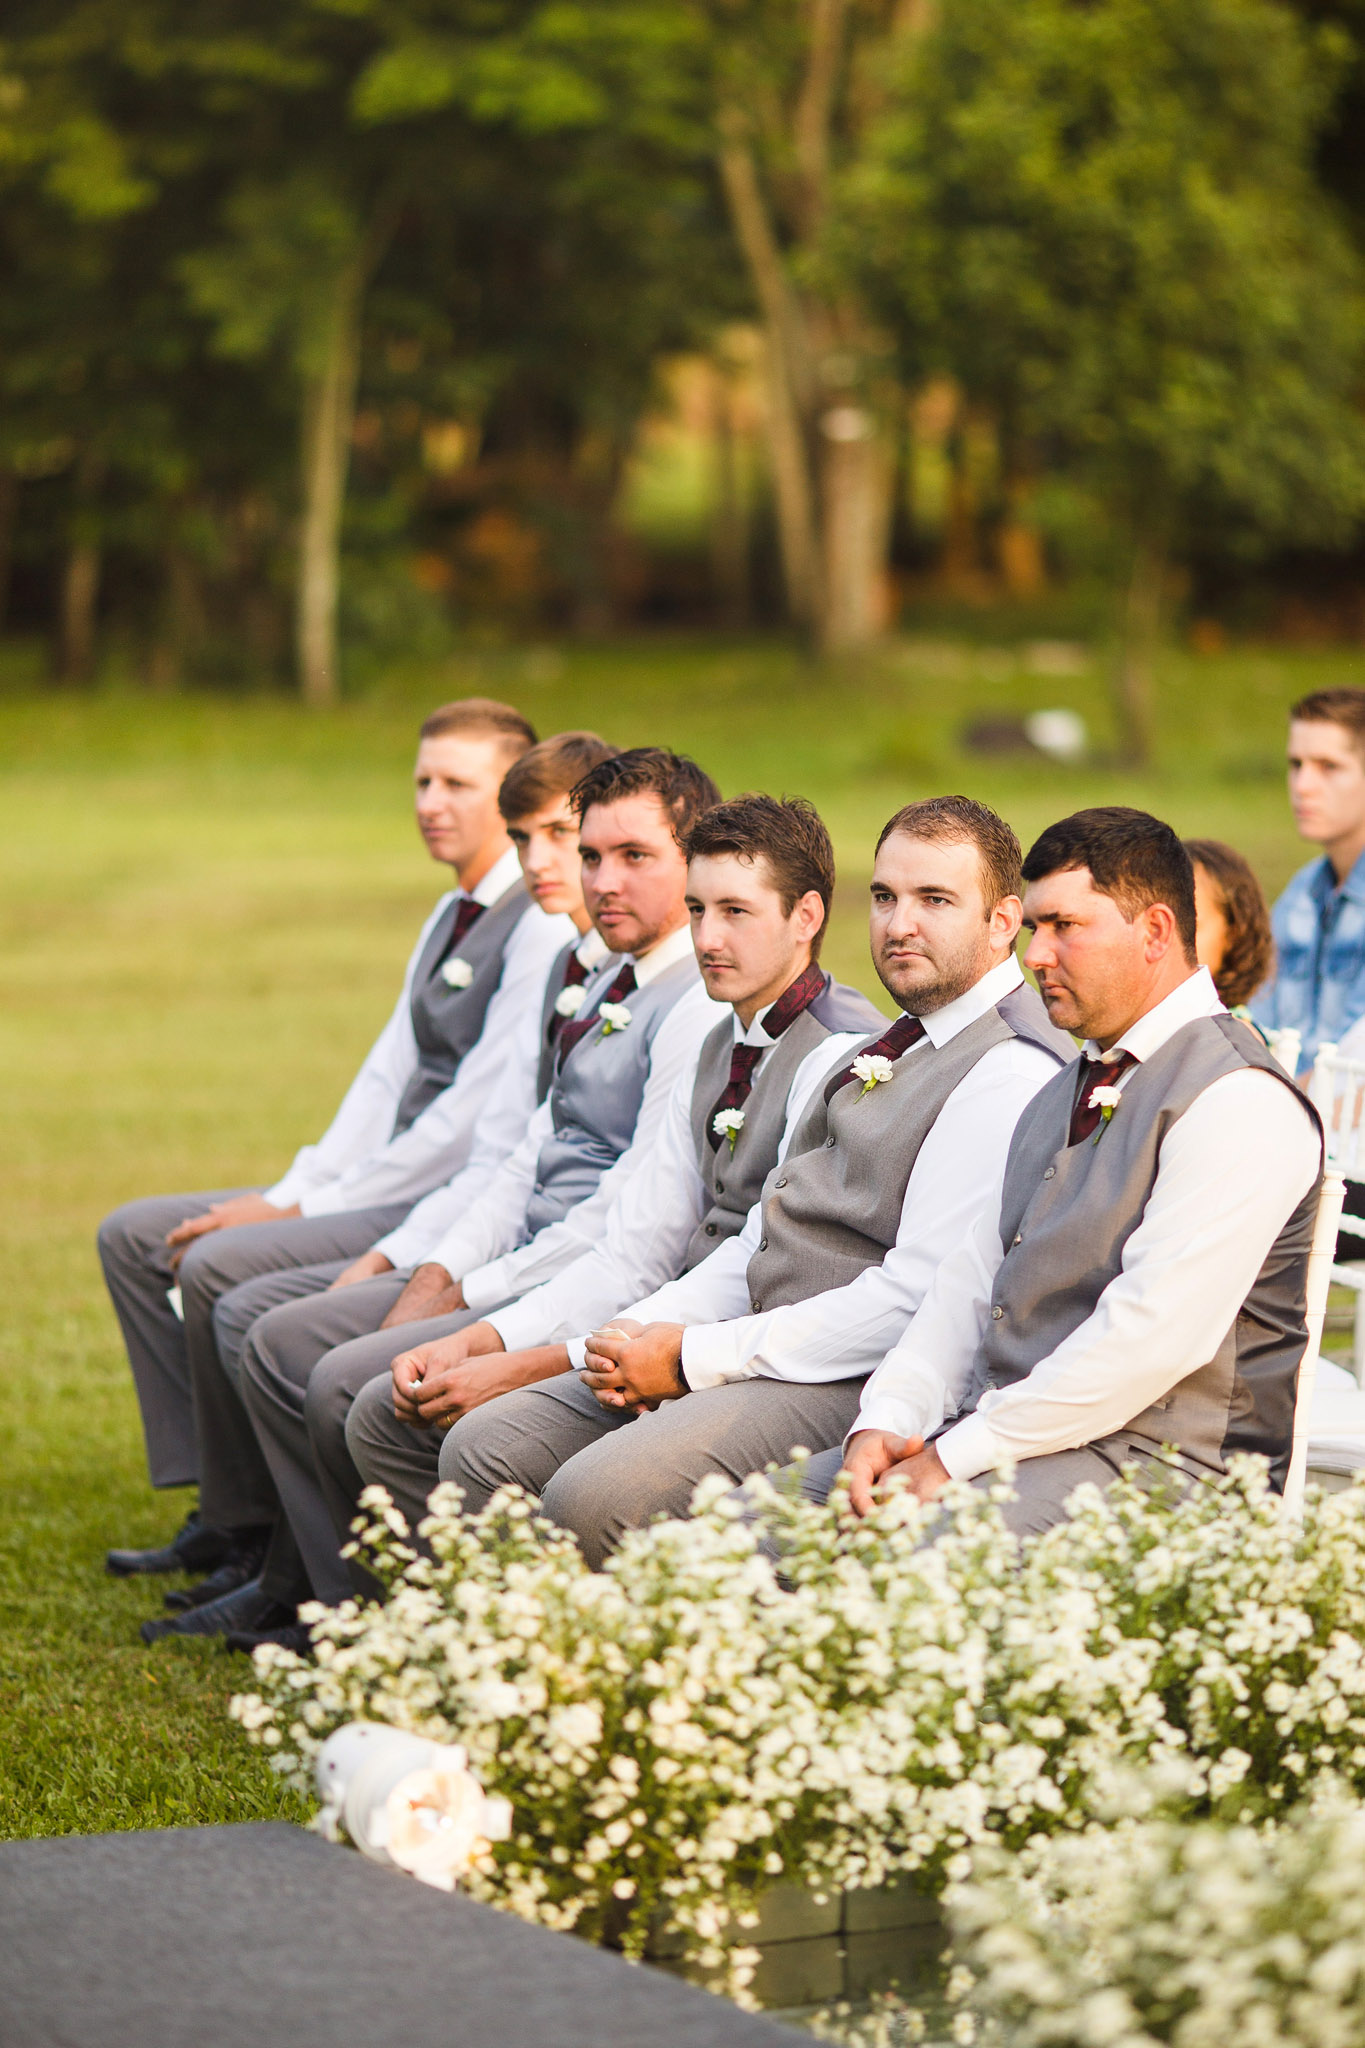 Wedding_Travellers_Destination_Wedding_Photography-72.jpg